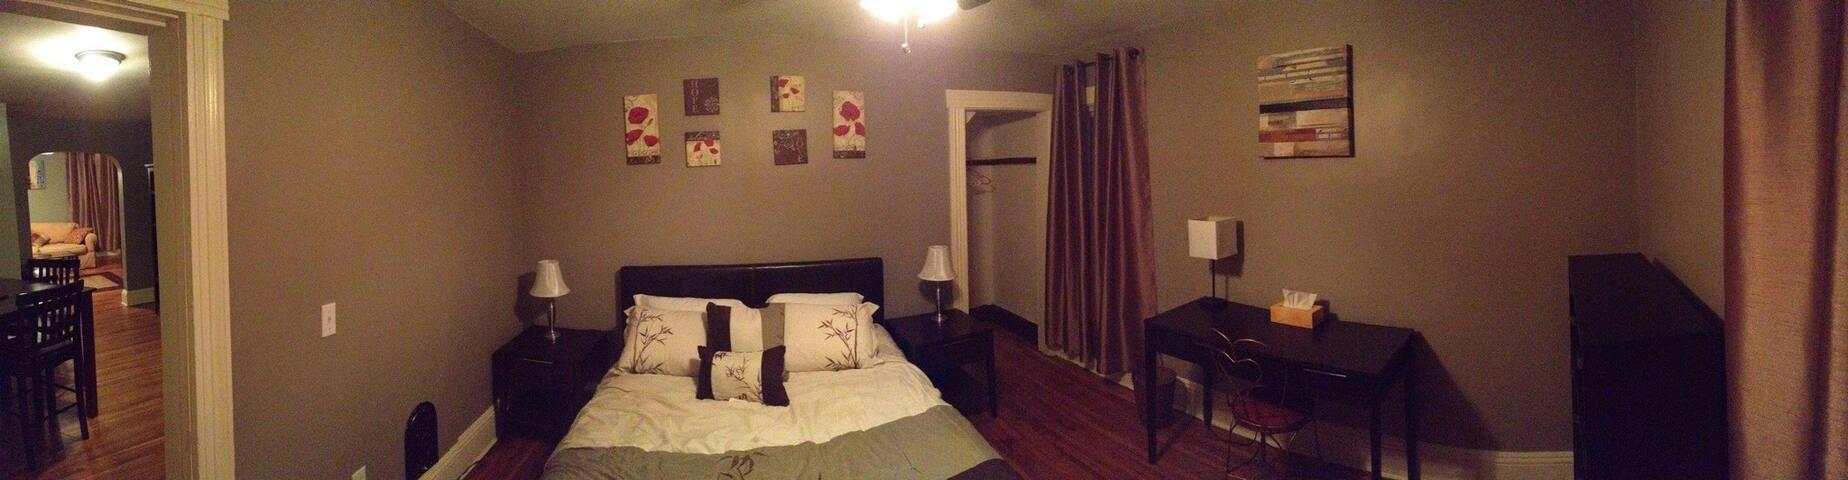 Beautifully renovated 1 Bedroom Apt Apartments